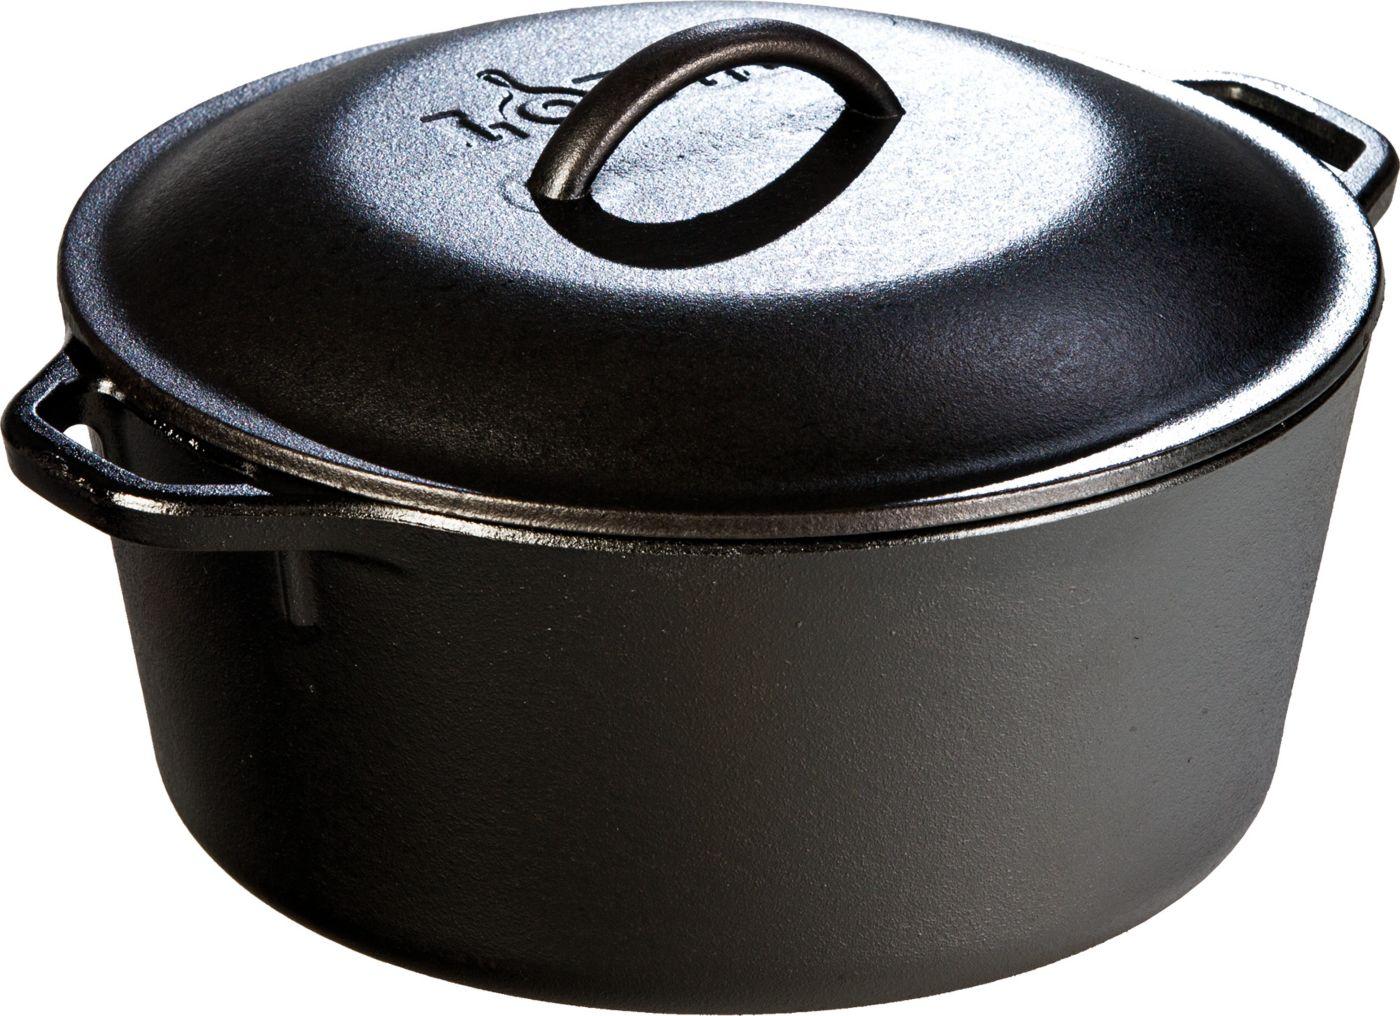 Lodge 5 Quart Cast Iron Dutch Oven